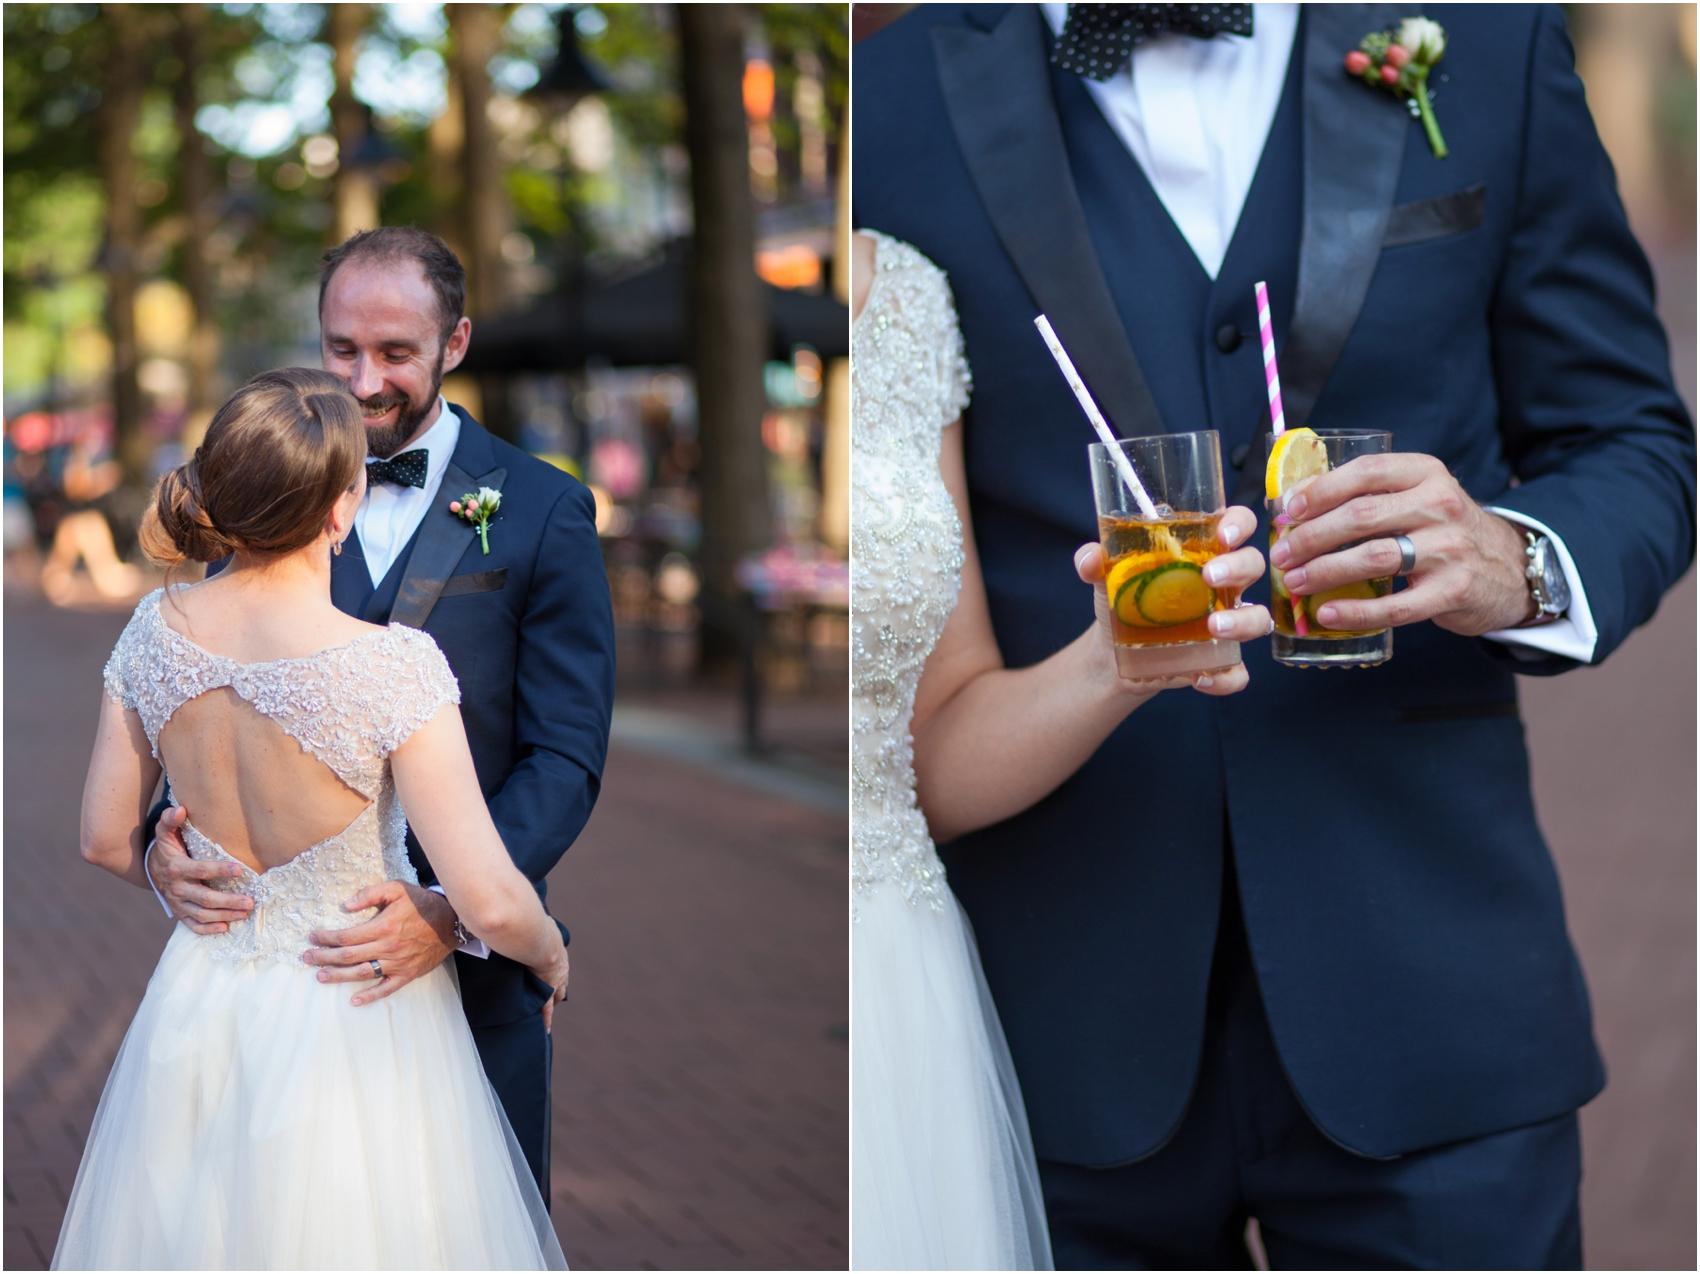 Old-Metropolitan-Hall-Wedding-Charlottesville-Virginia-2-33.jpg